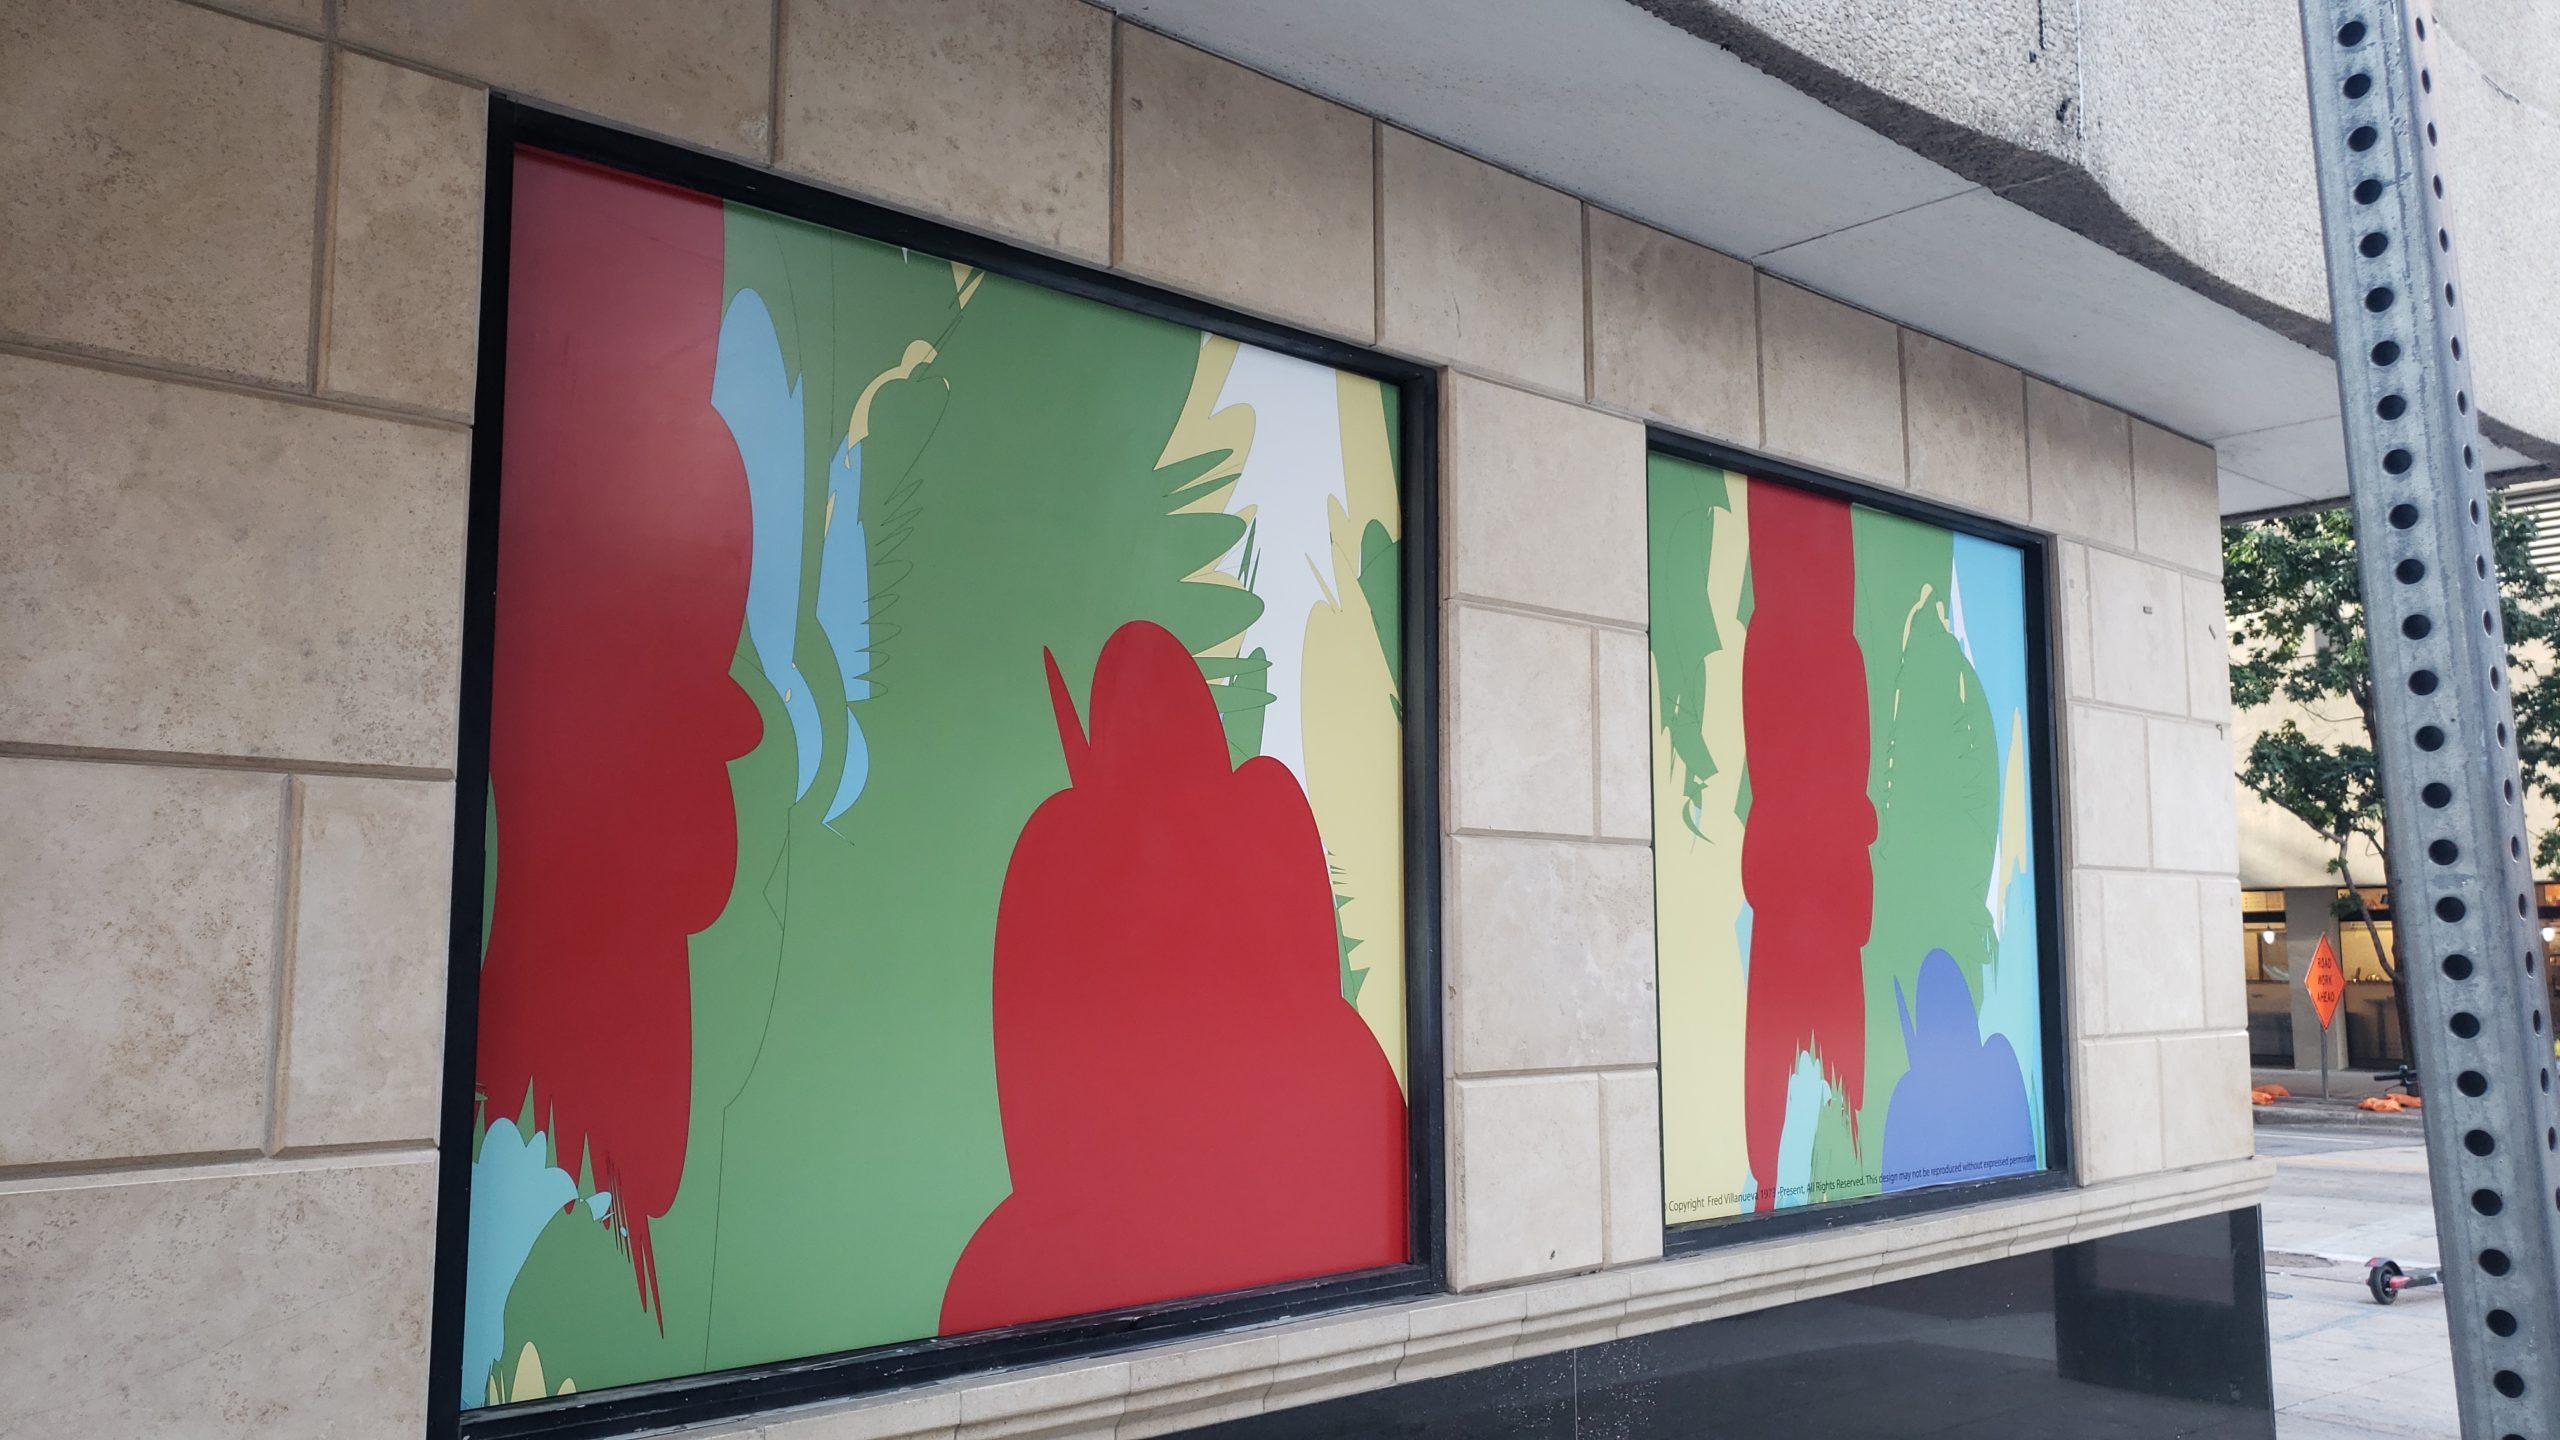 Public Abstract Art